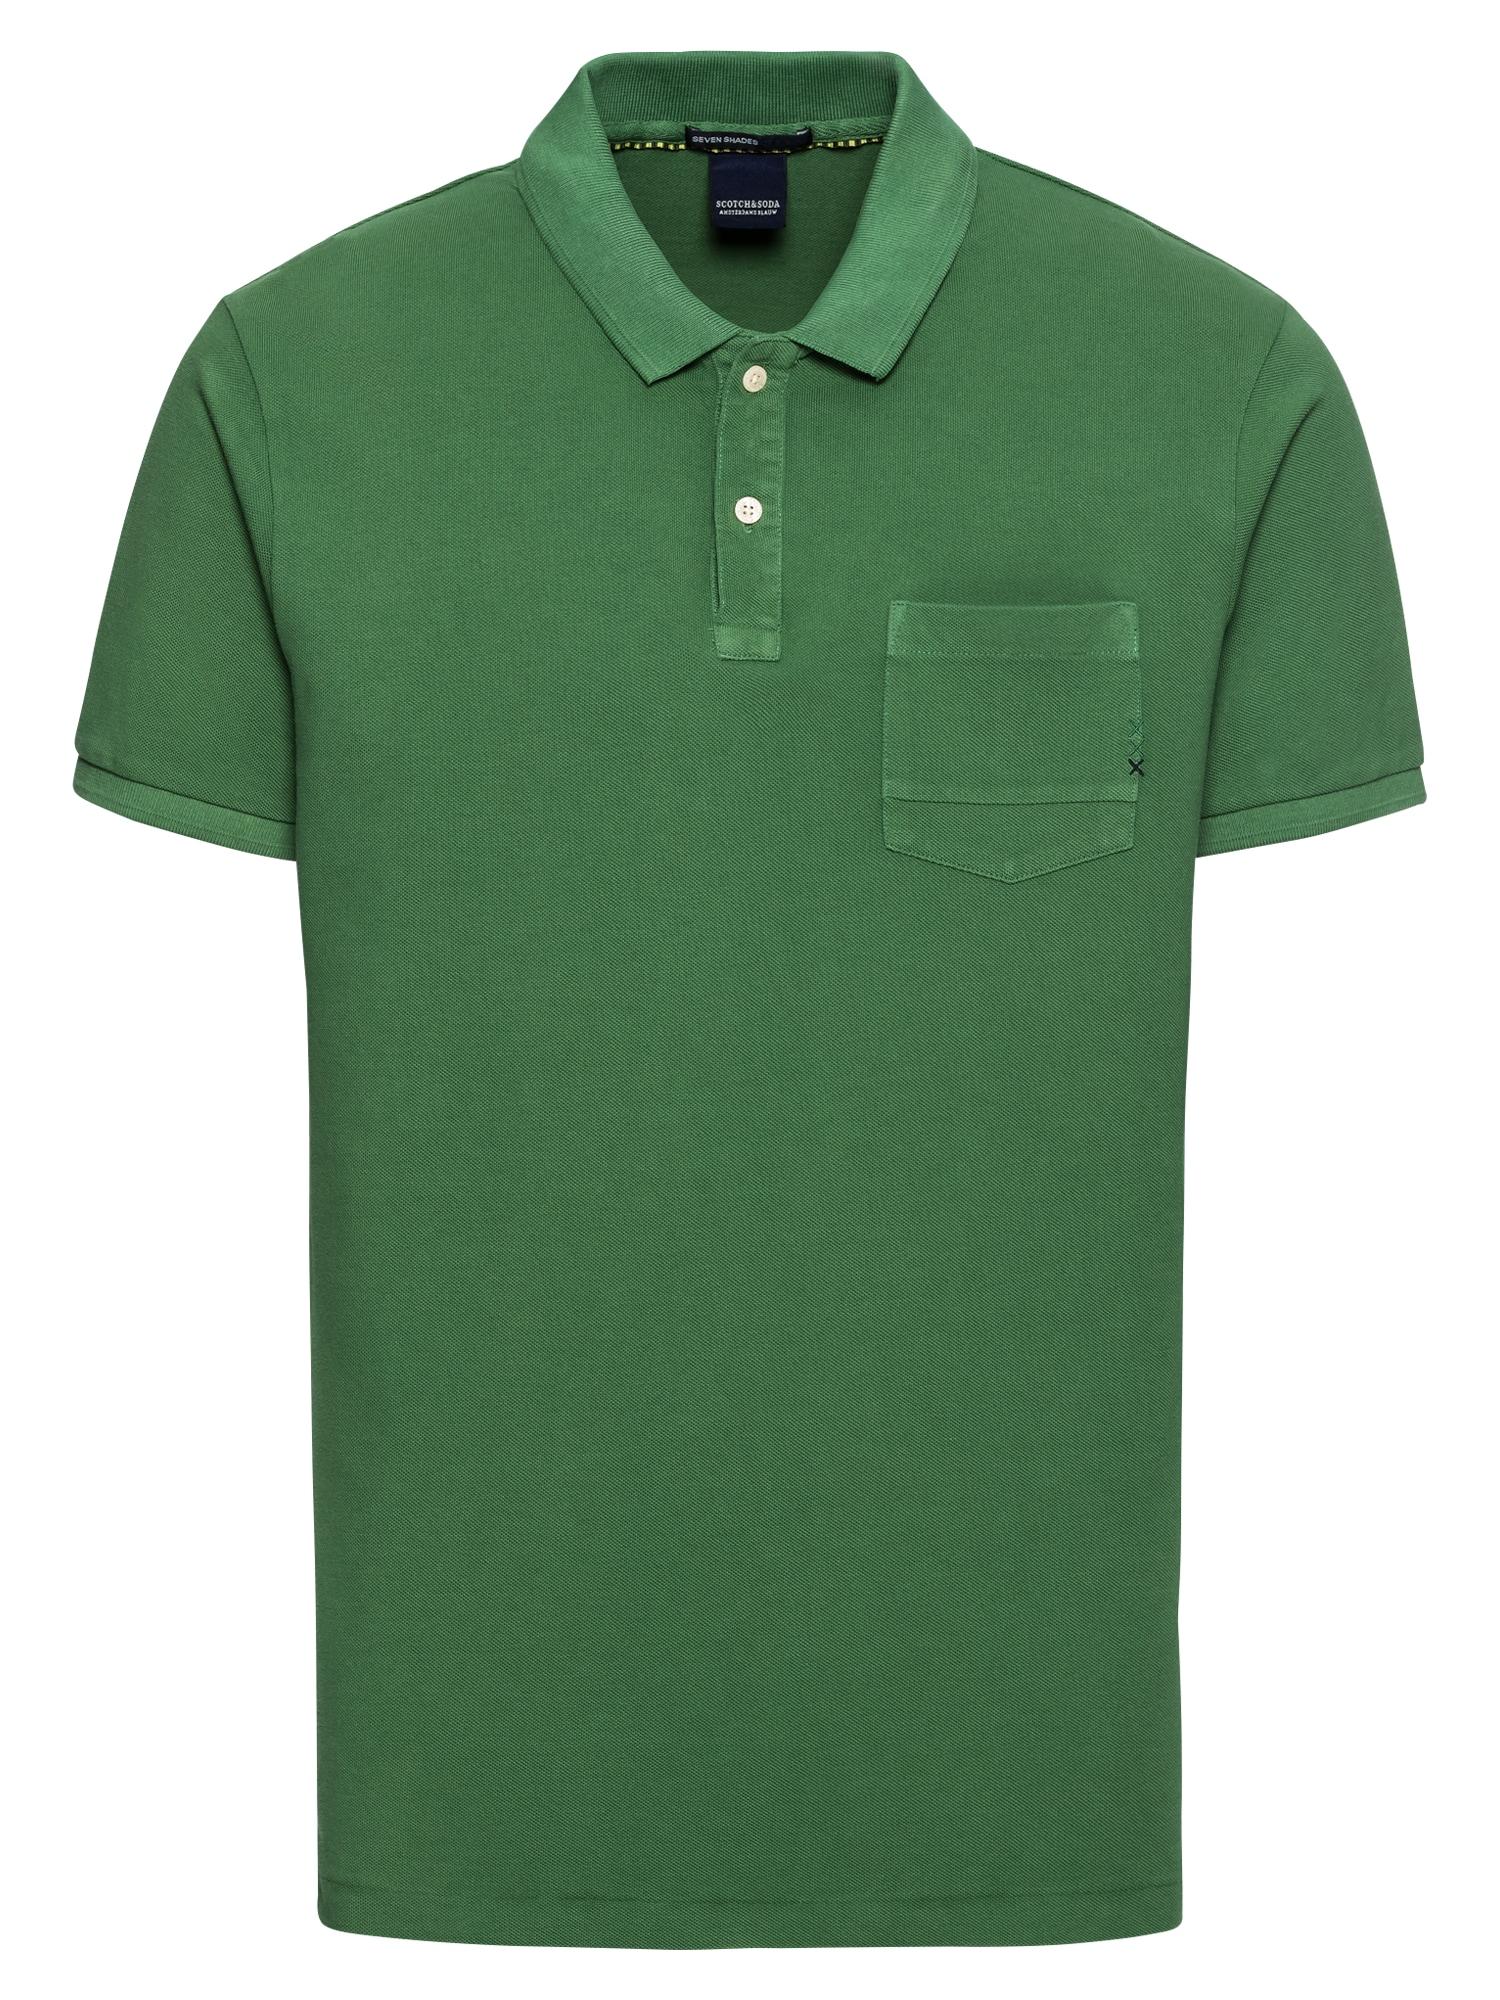 SCOTCH  and  SODA Heren Shirt Ams Blauw garment dyed polo with XXX pocket groen